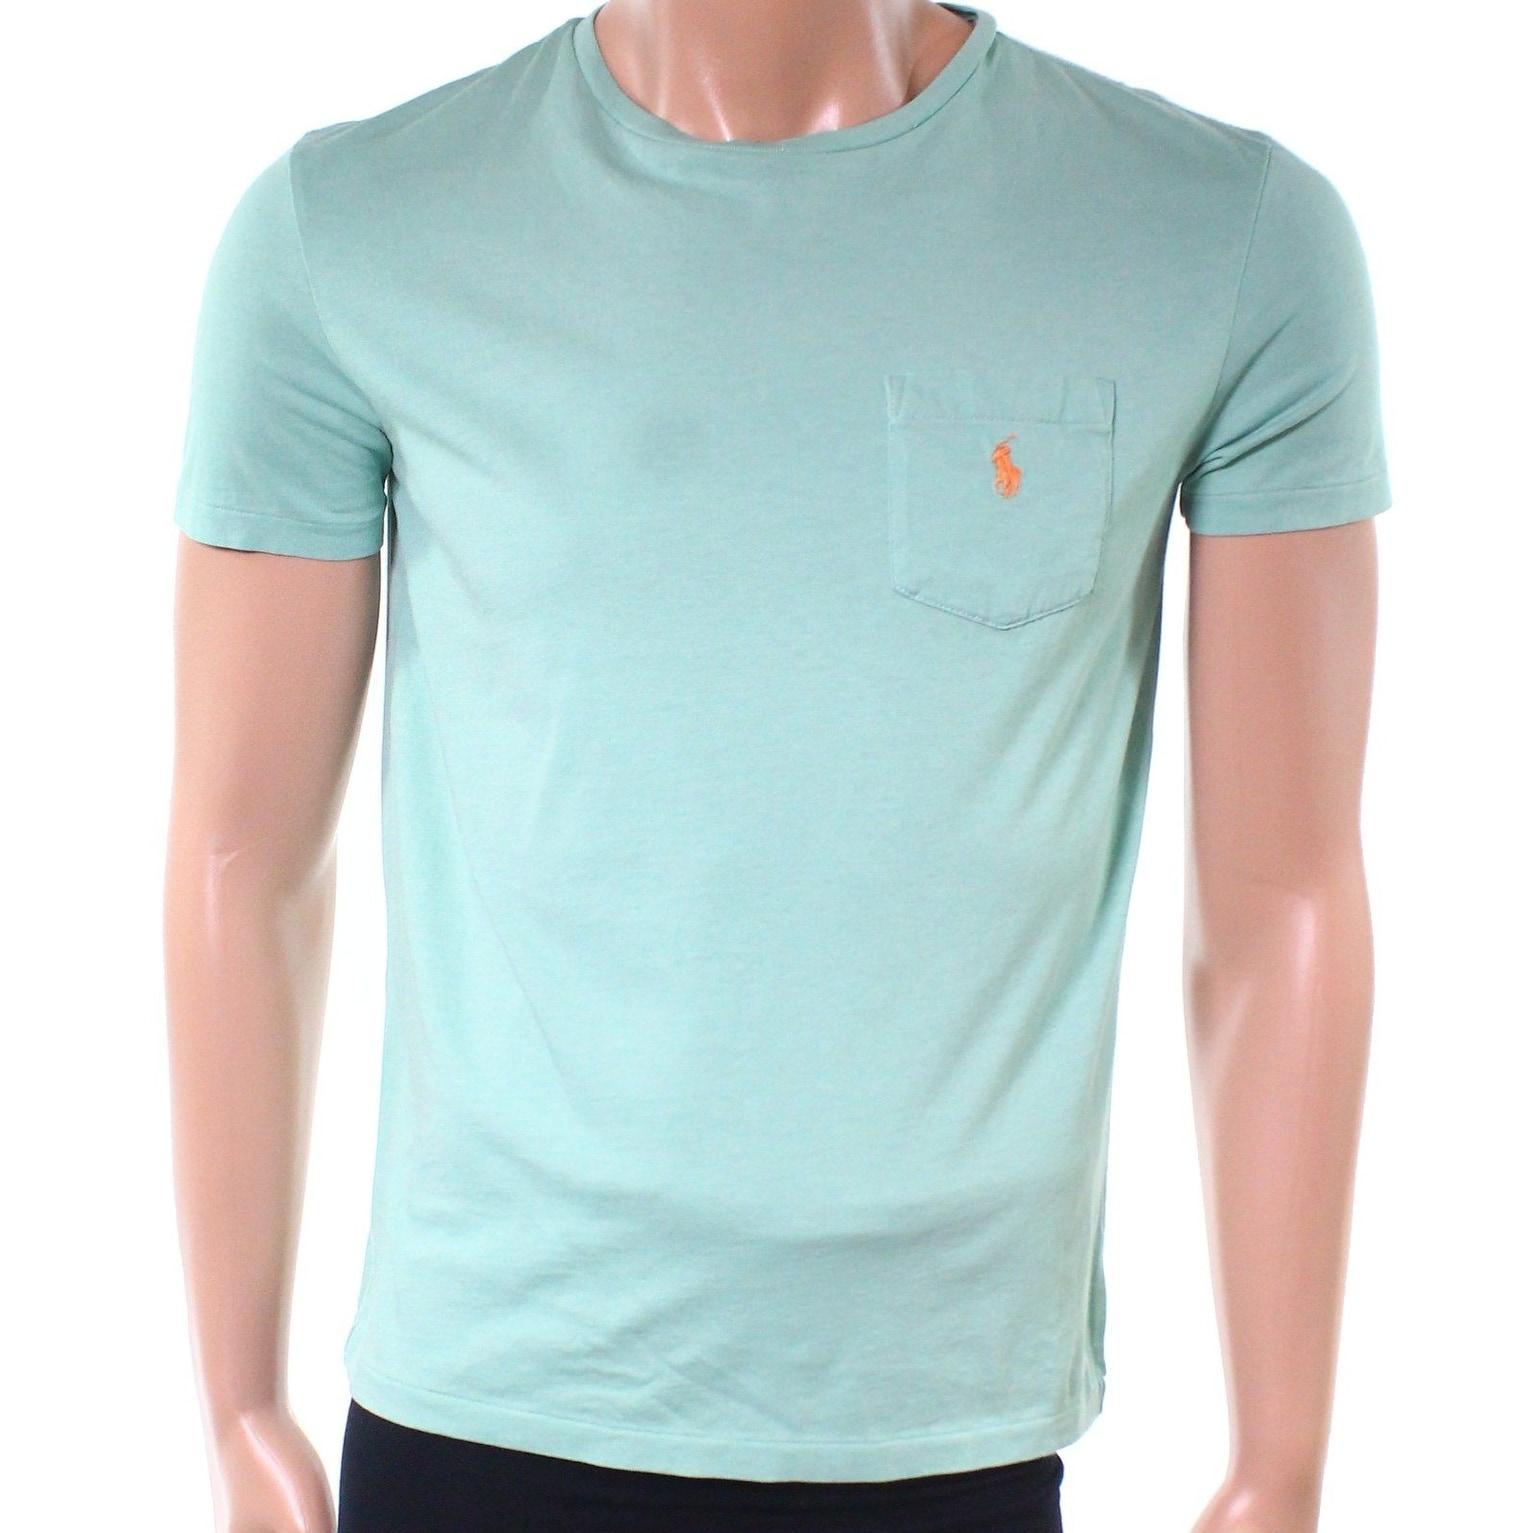 Shop Polo Ralph Lauren New Green Mens Size Medium M Crewneck Tee T